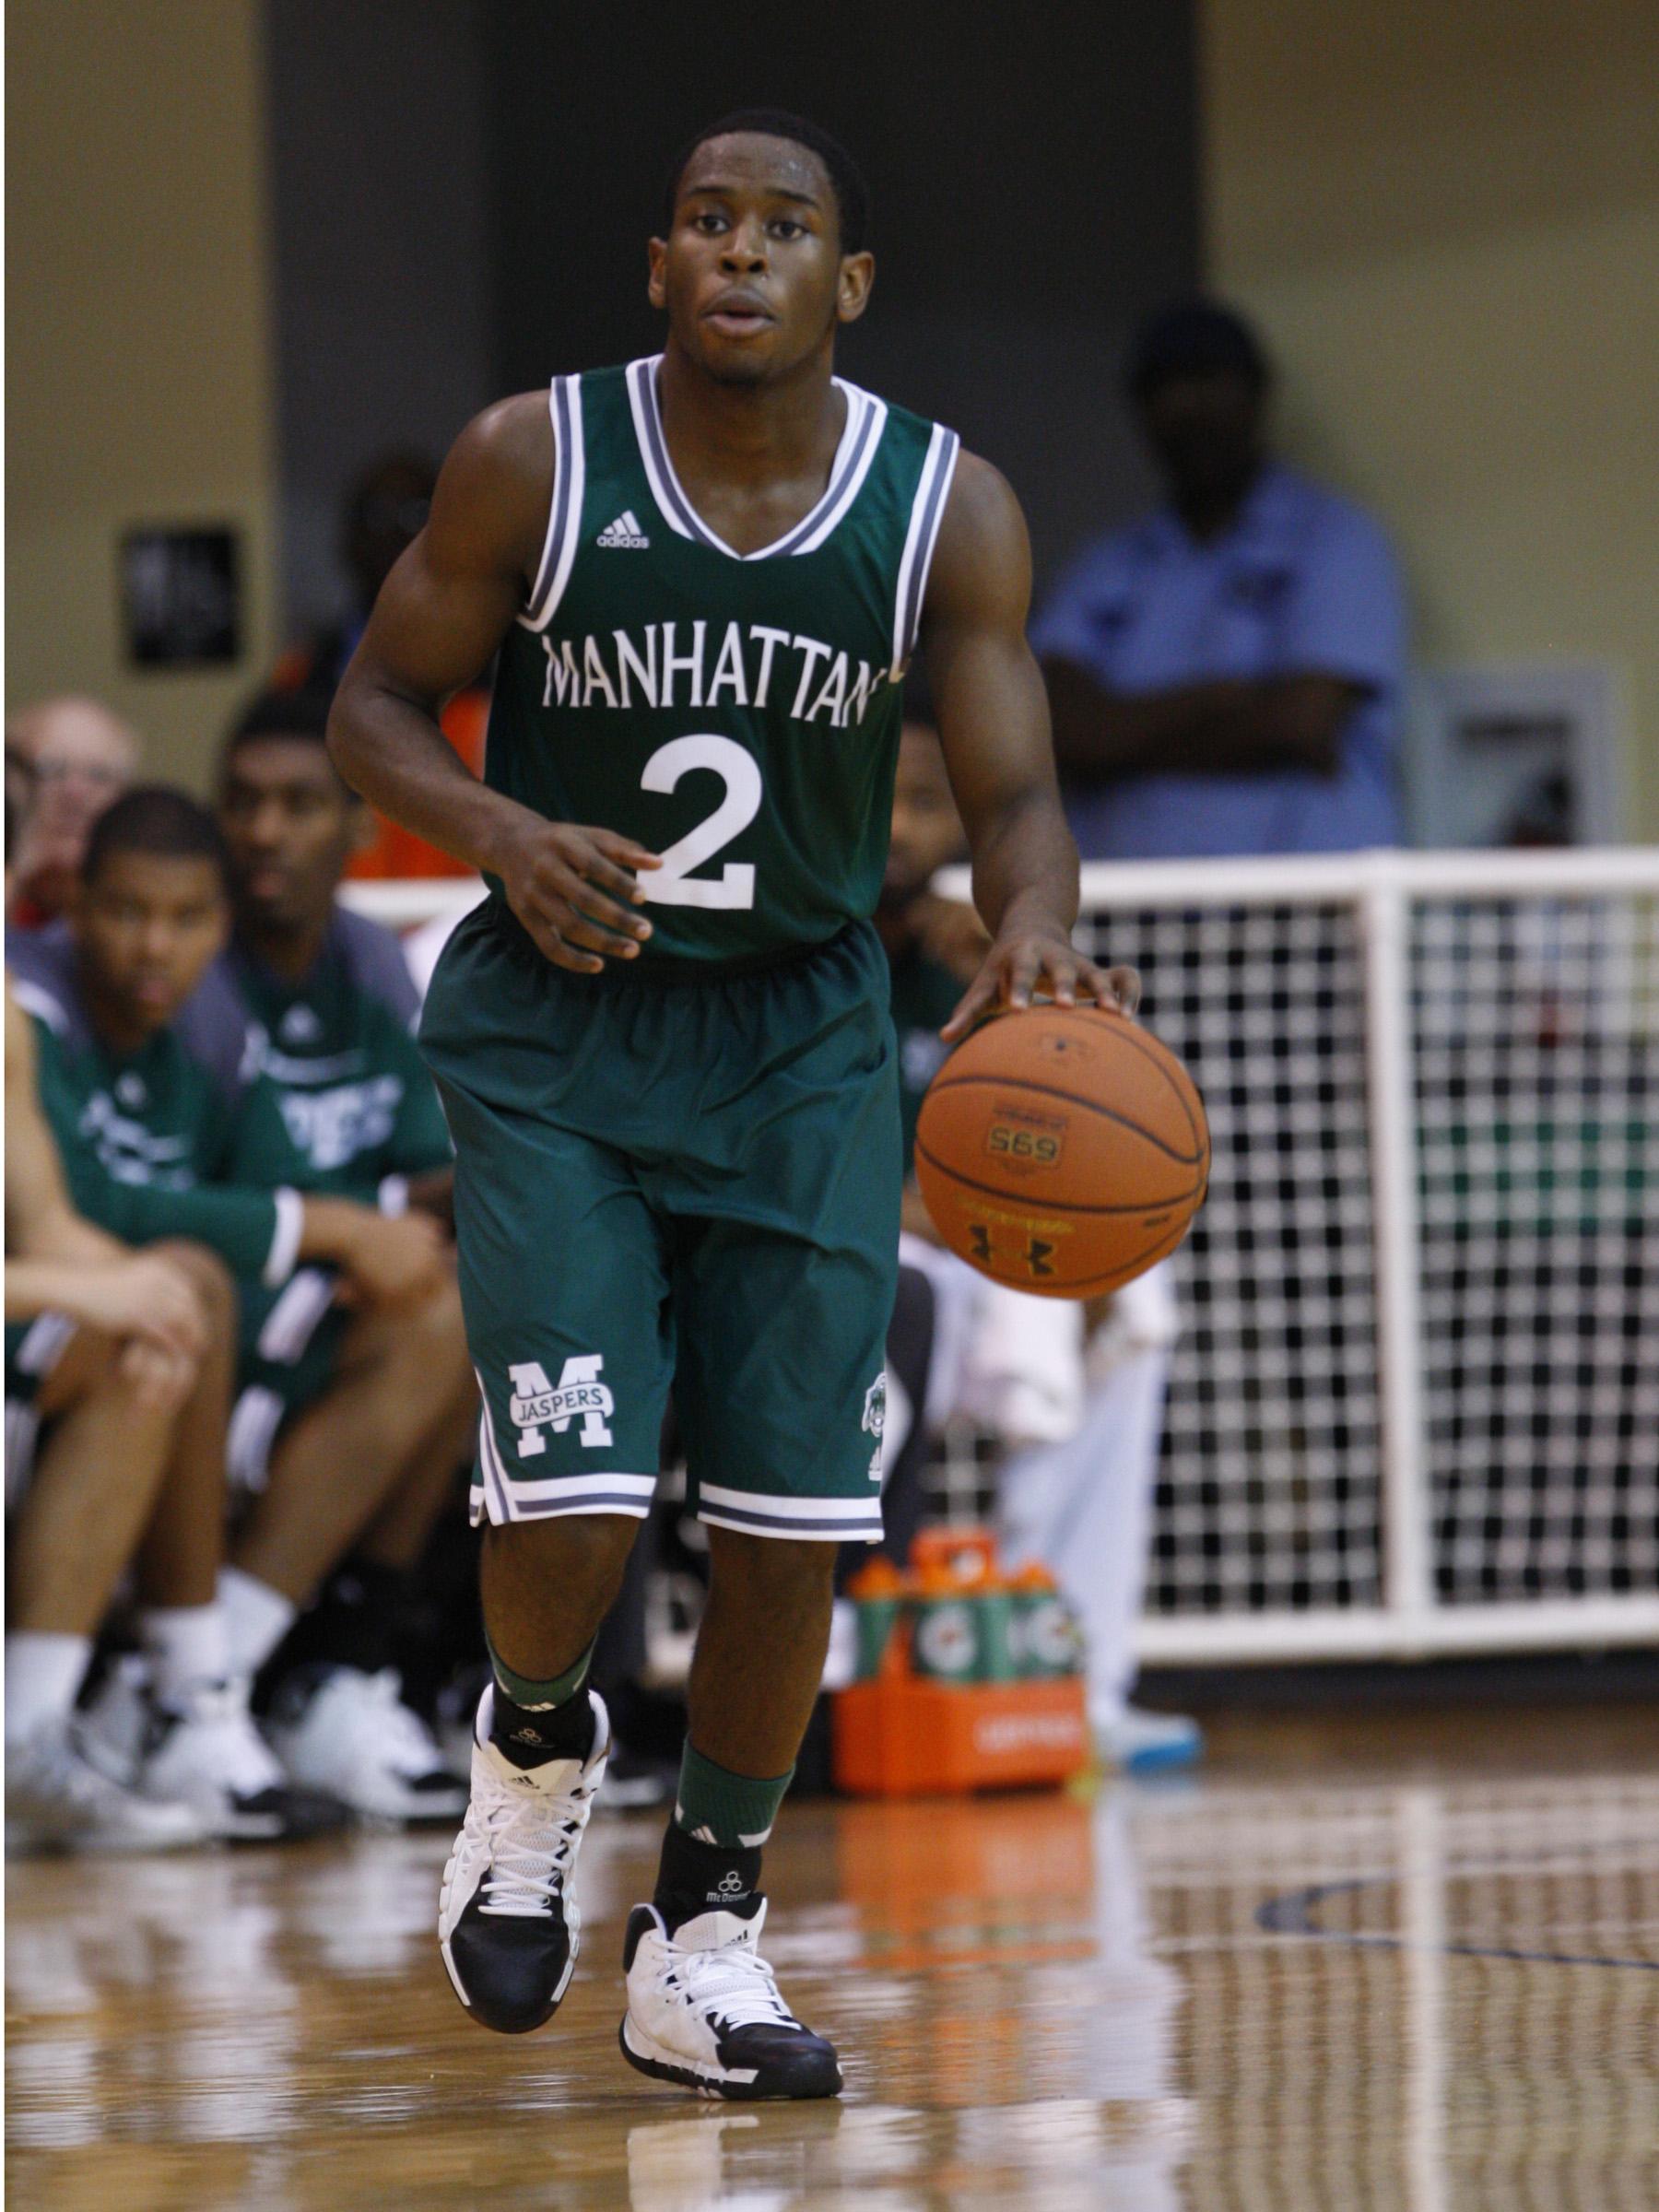 Manhattan vs La Salle Men's basketball game at Lasalle University.11/9/13 Noah K. Murray